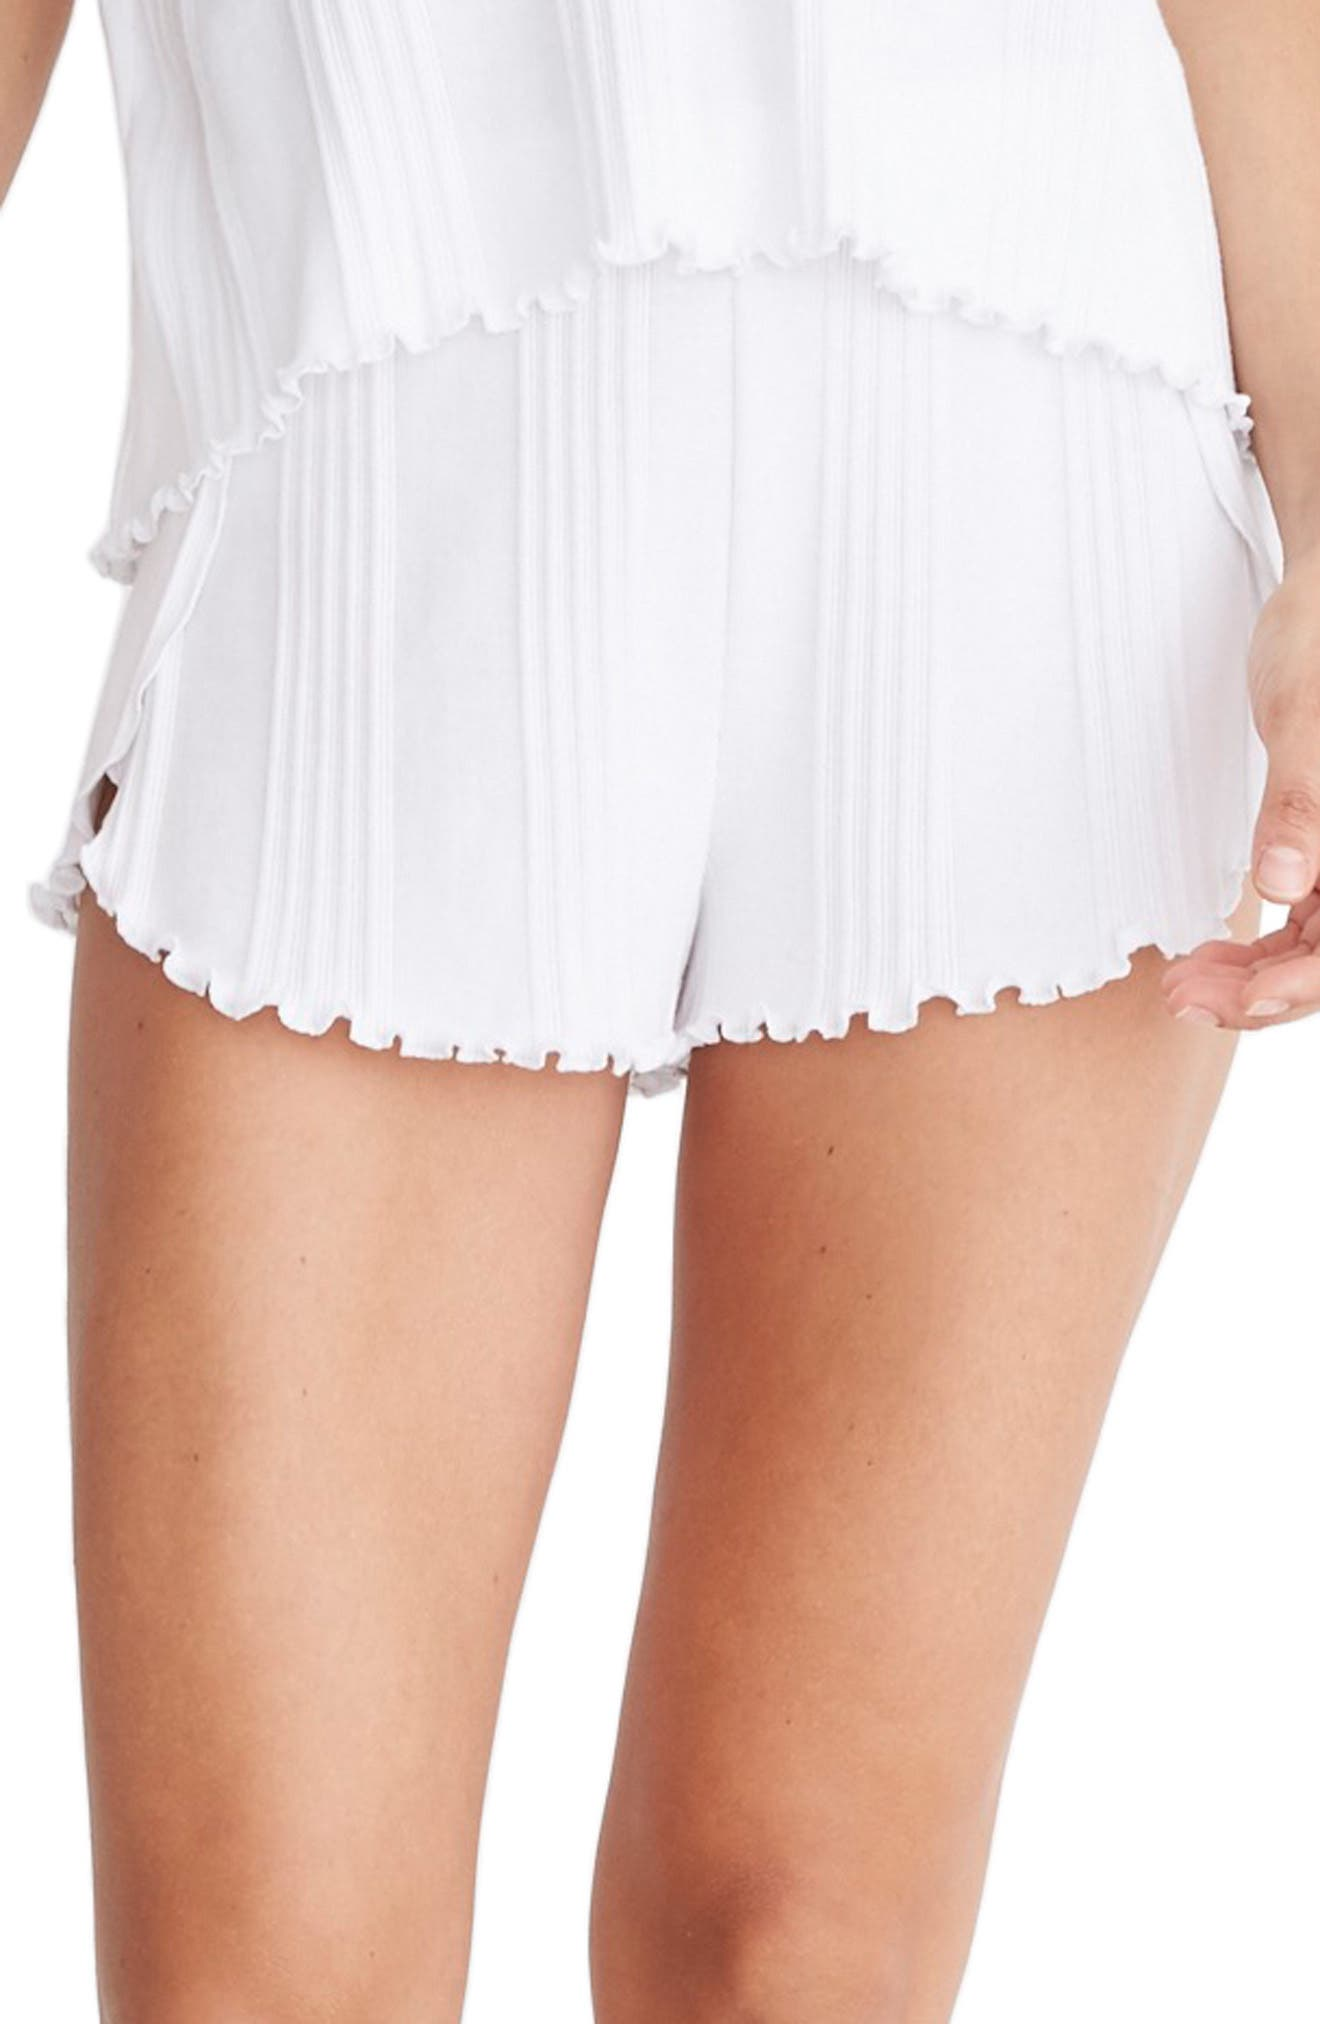 Madewell Ribbed Knit Pajama Shorts, White